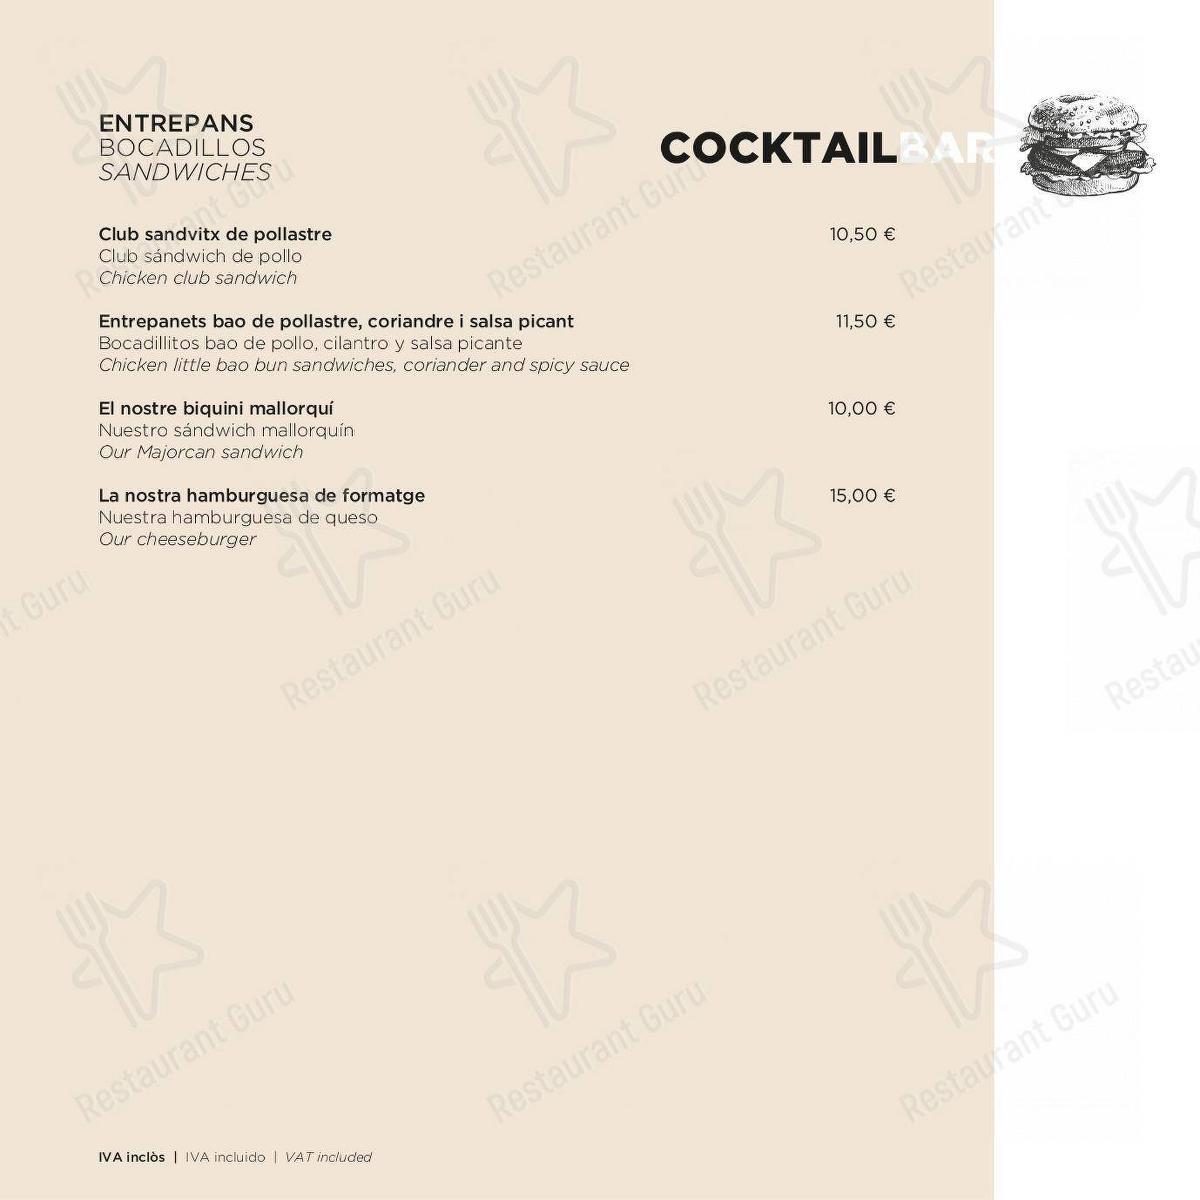 ECHO Restaurant - Cocktail Bar menu